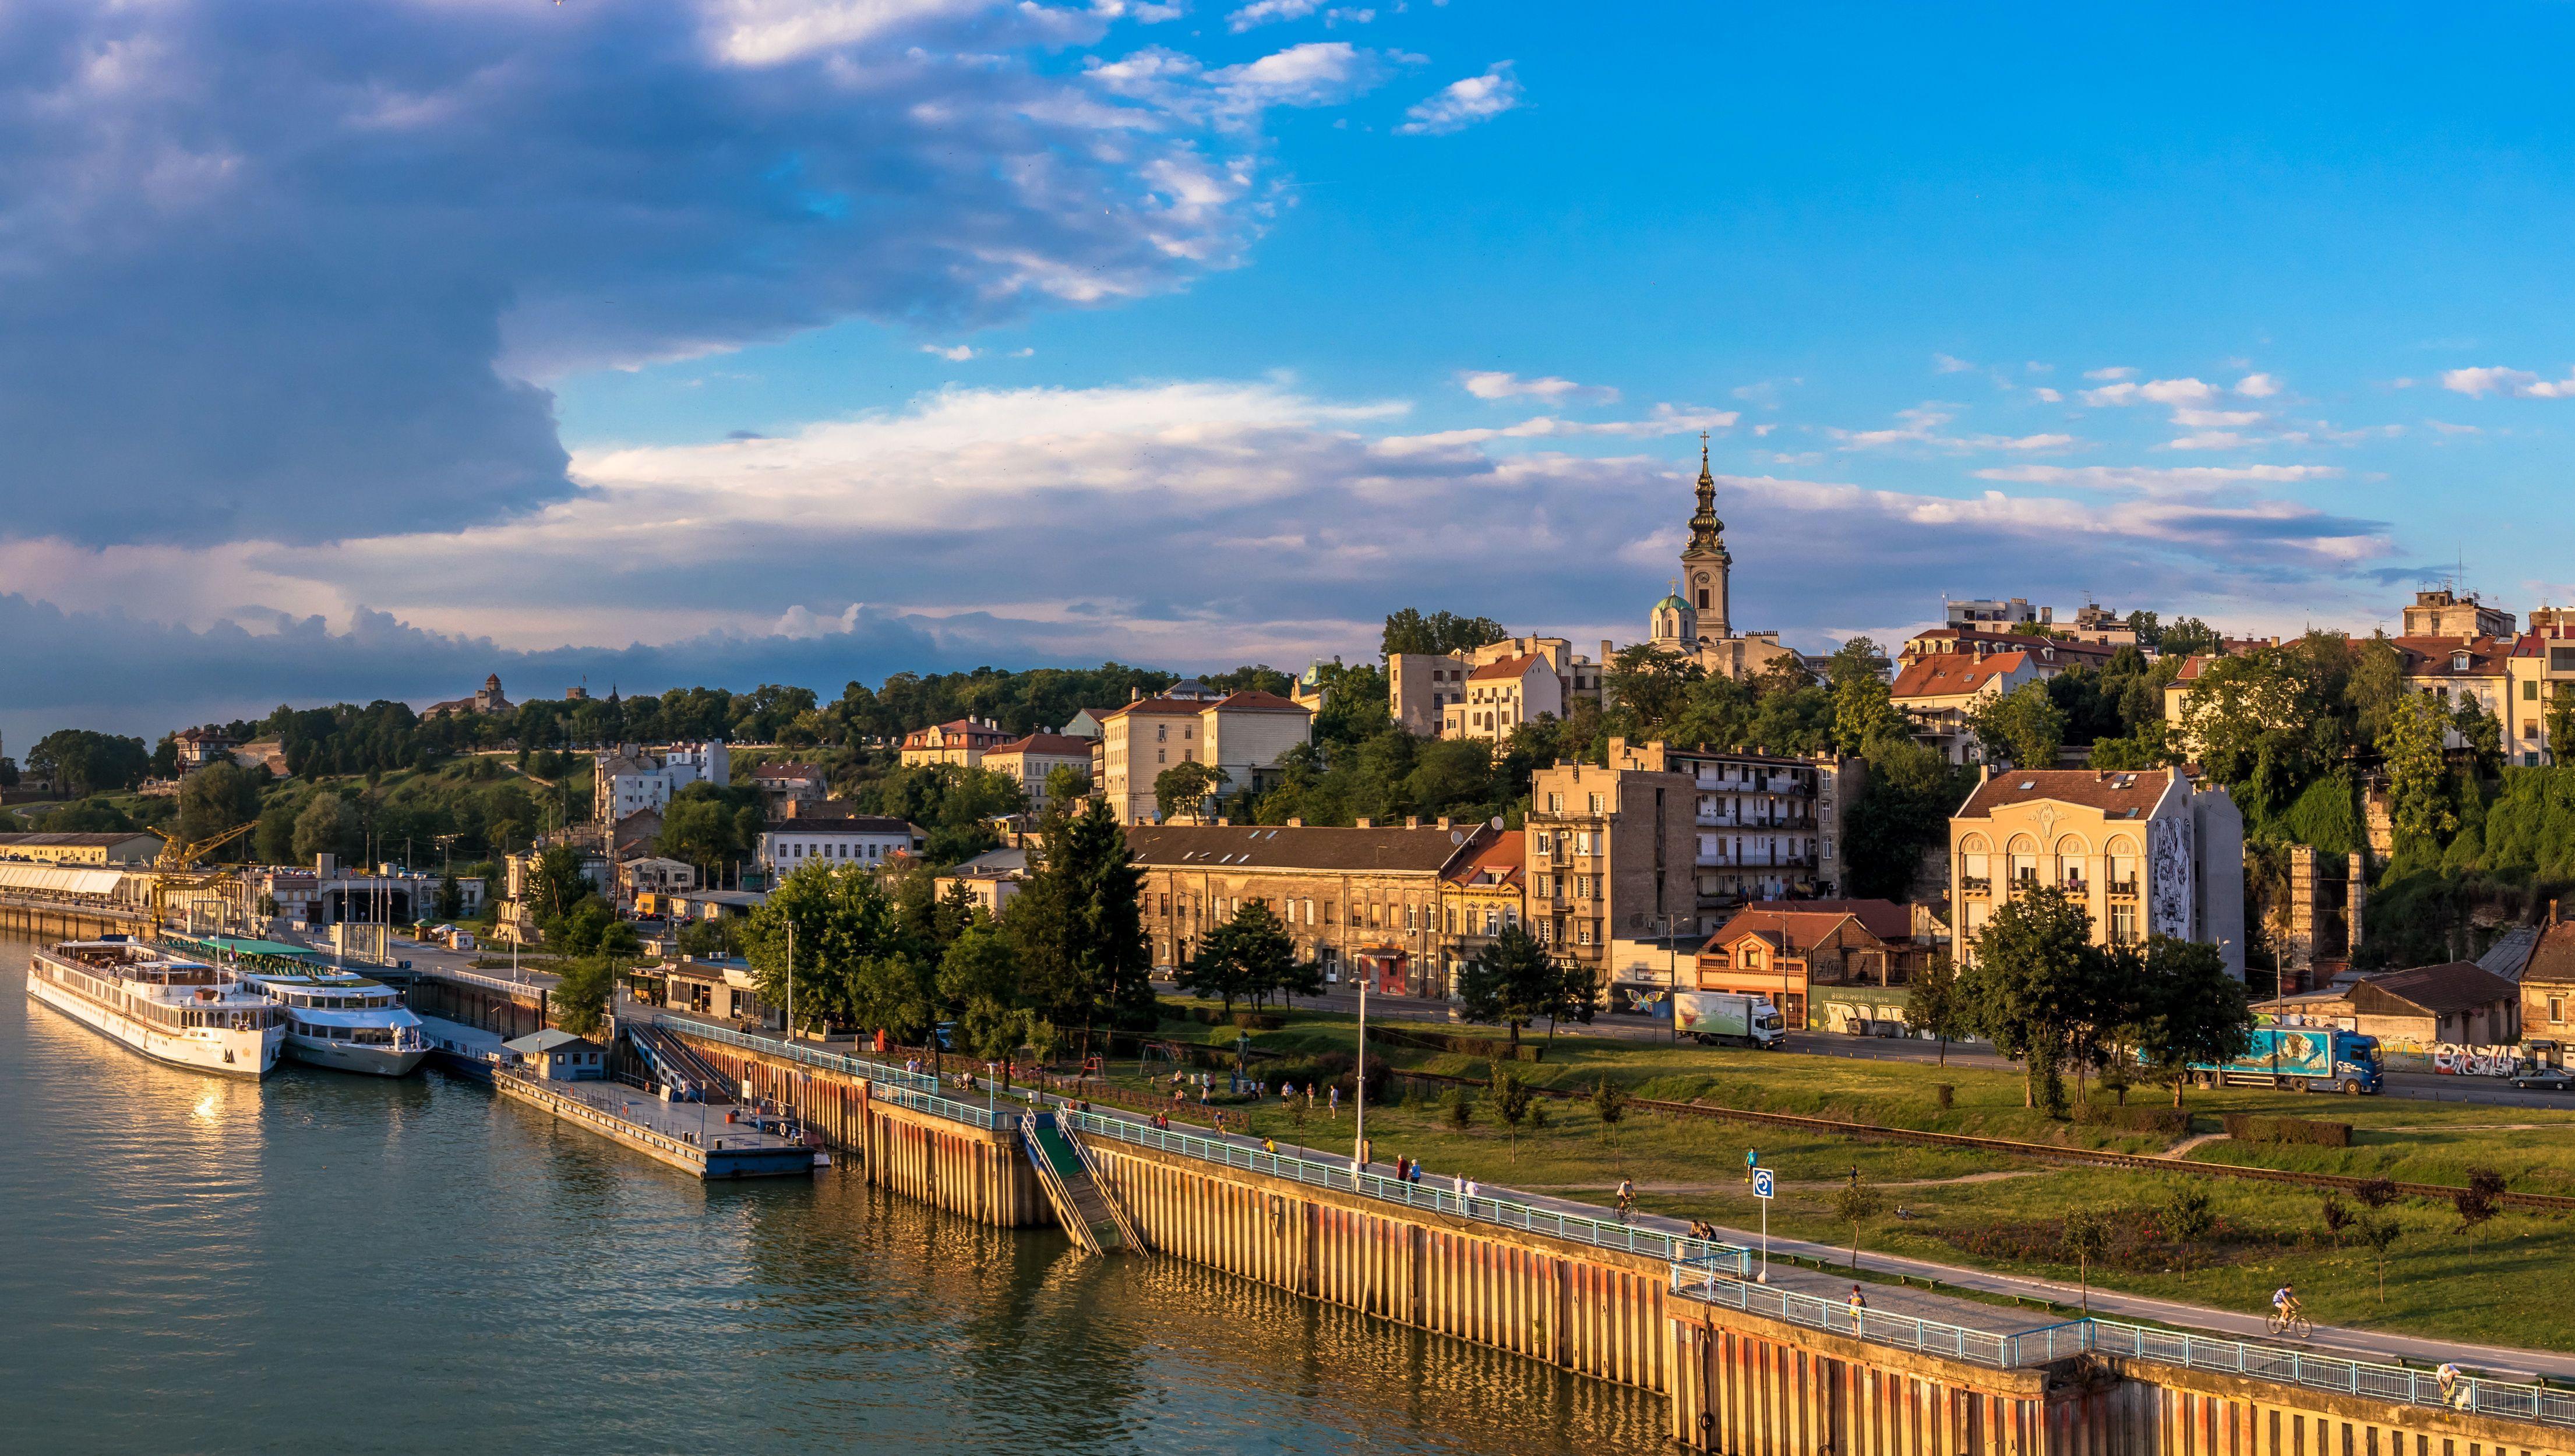 Photos Serbia Belgrade Sky Berth Rivers Cities Houses 4420x2500